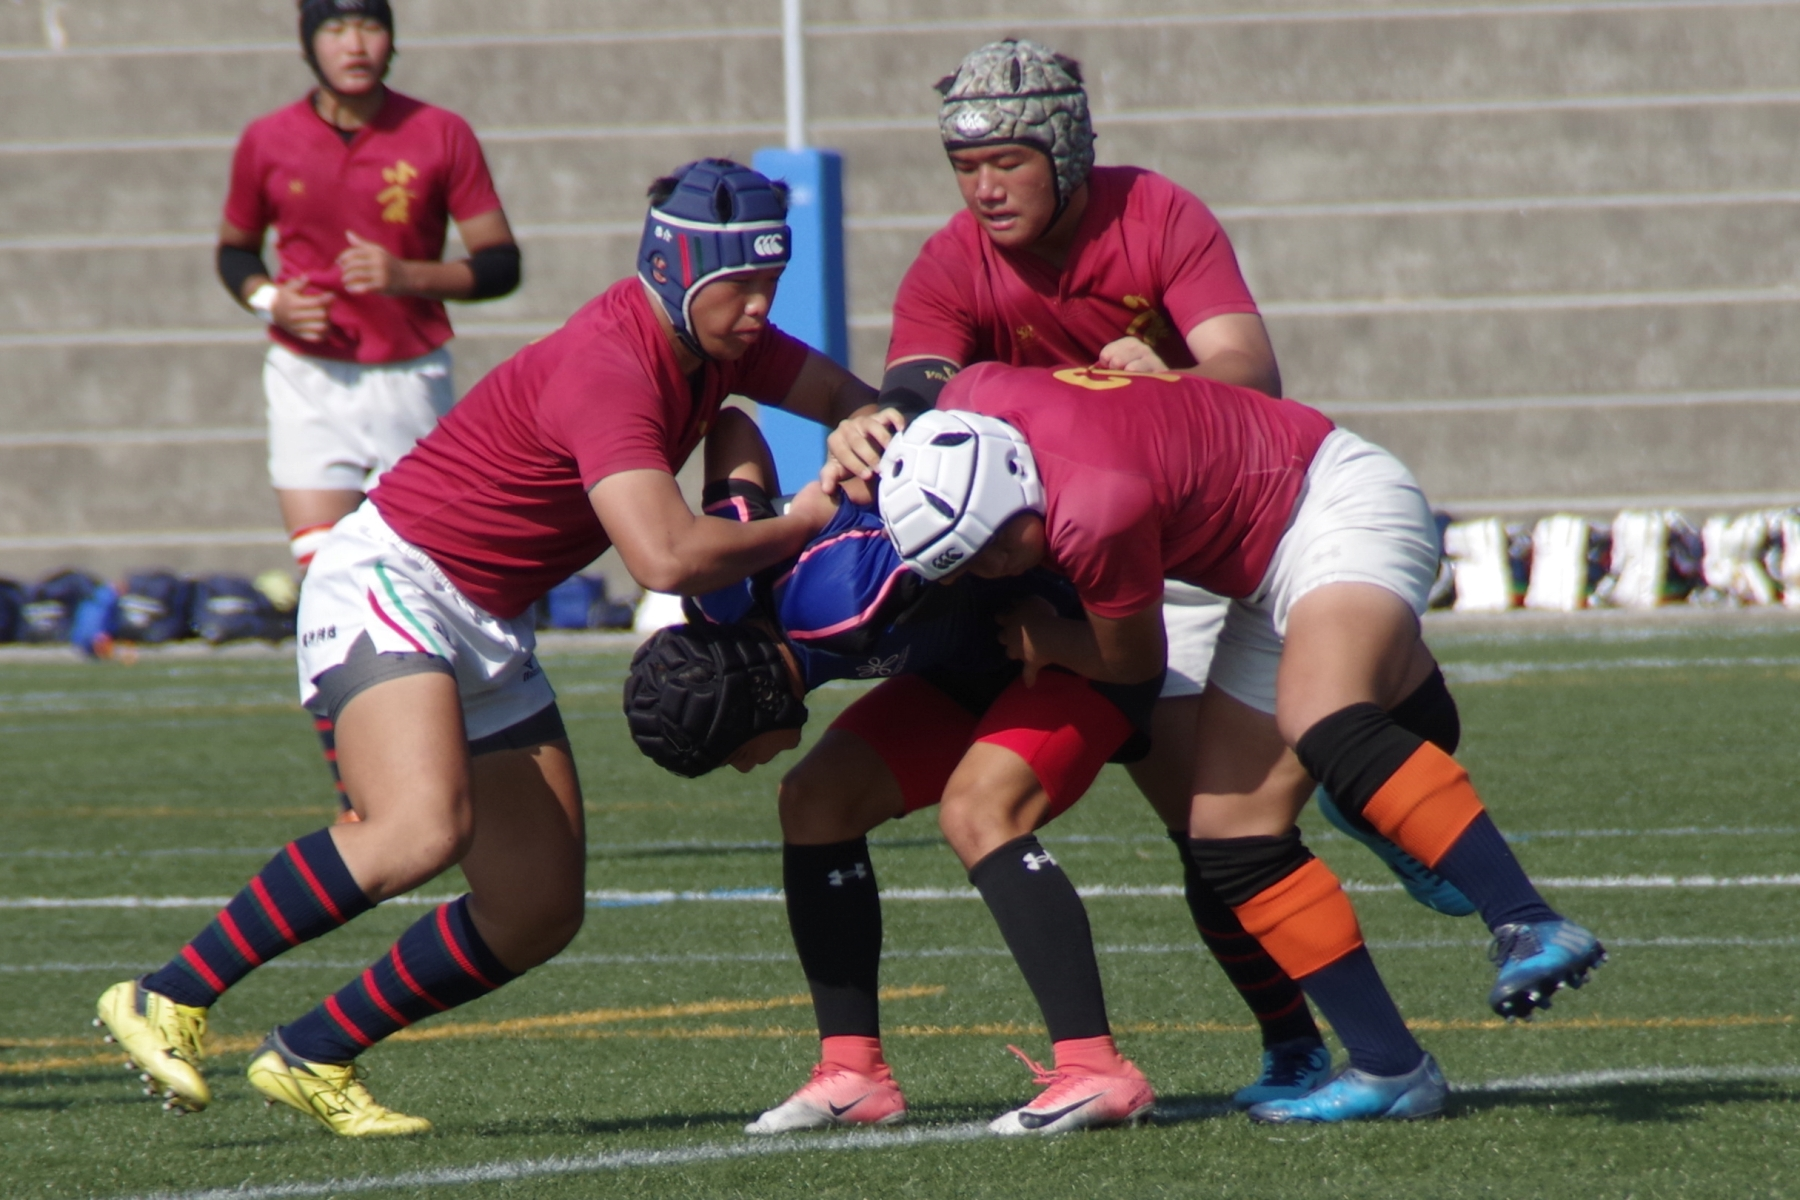 http://kokura-rugby.sakura.ne.jp/180807_160230_0057.jpg